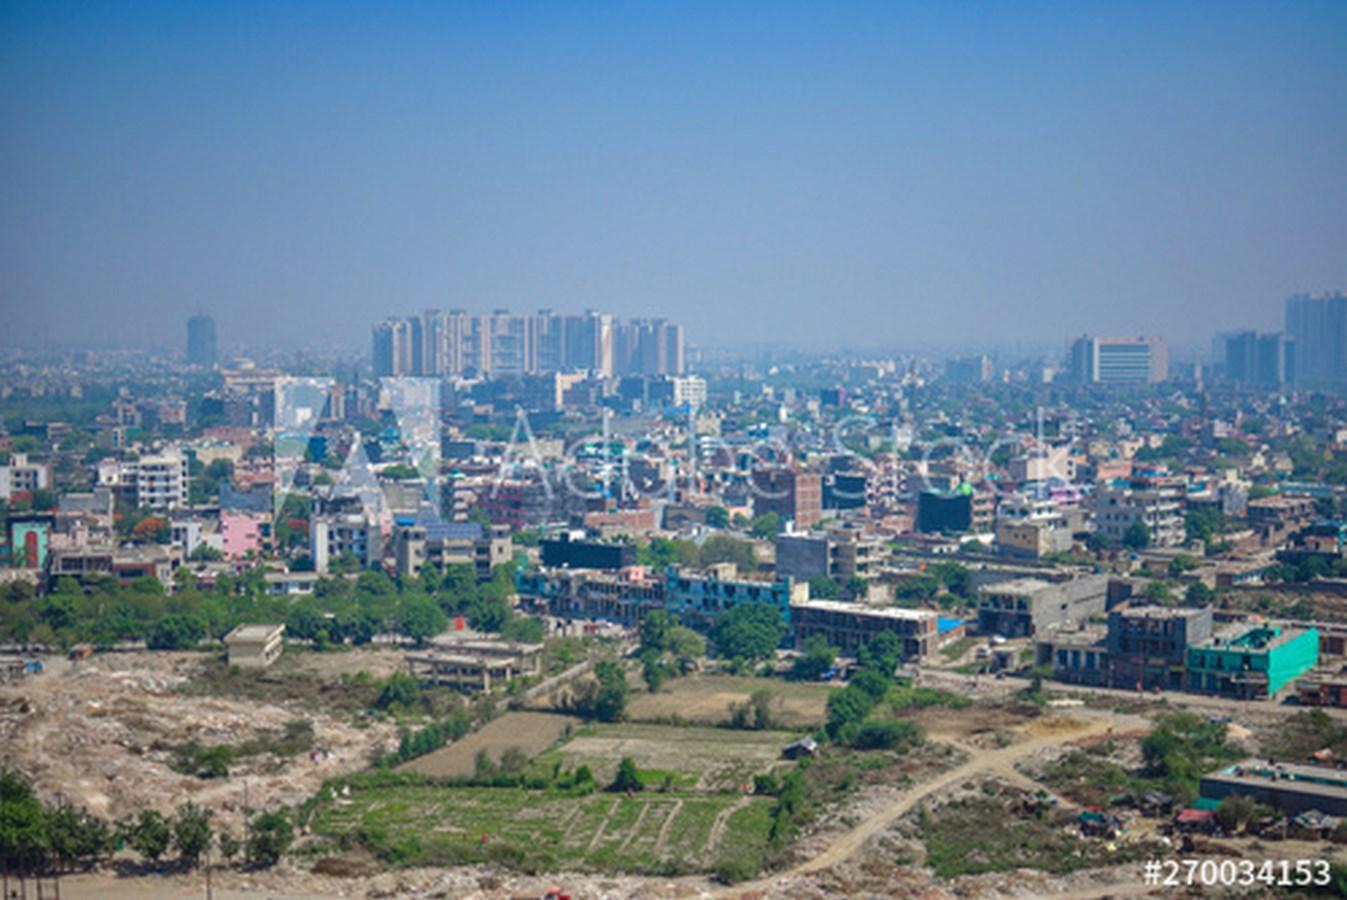 Noida, Uttar Pradesh - Sheet1